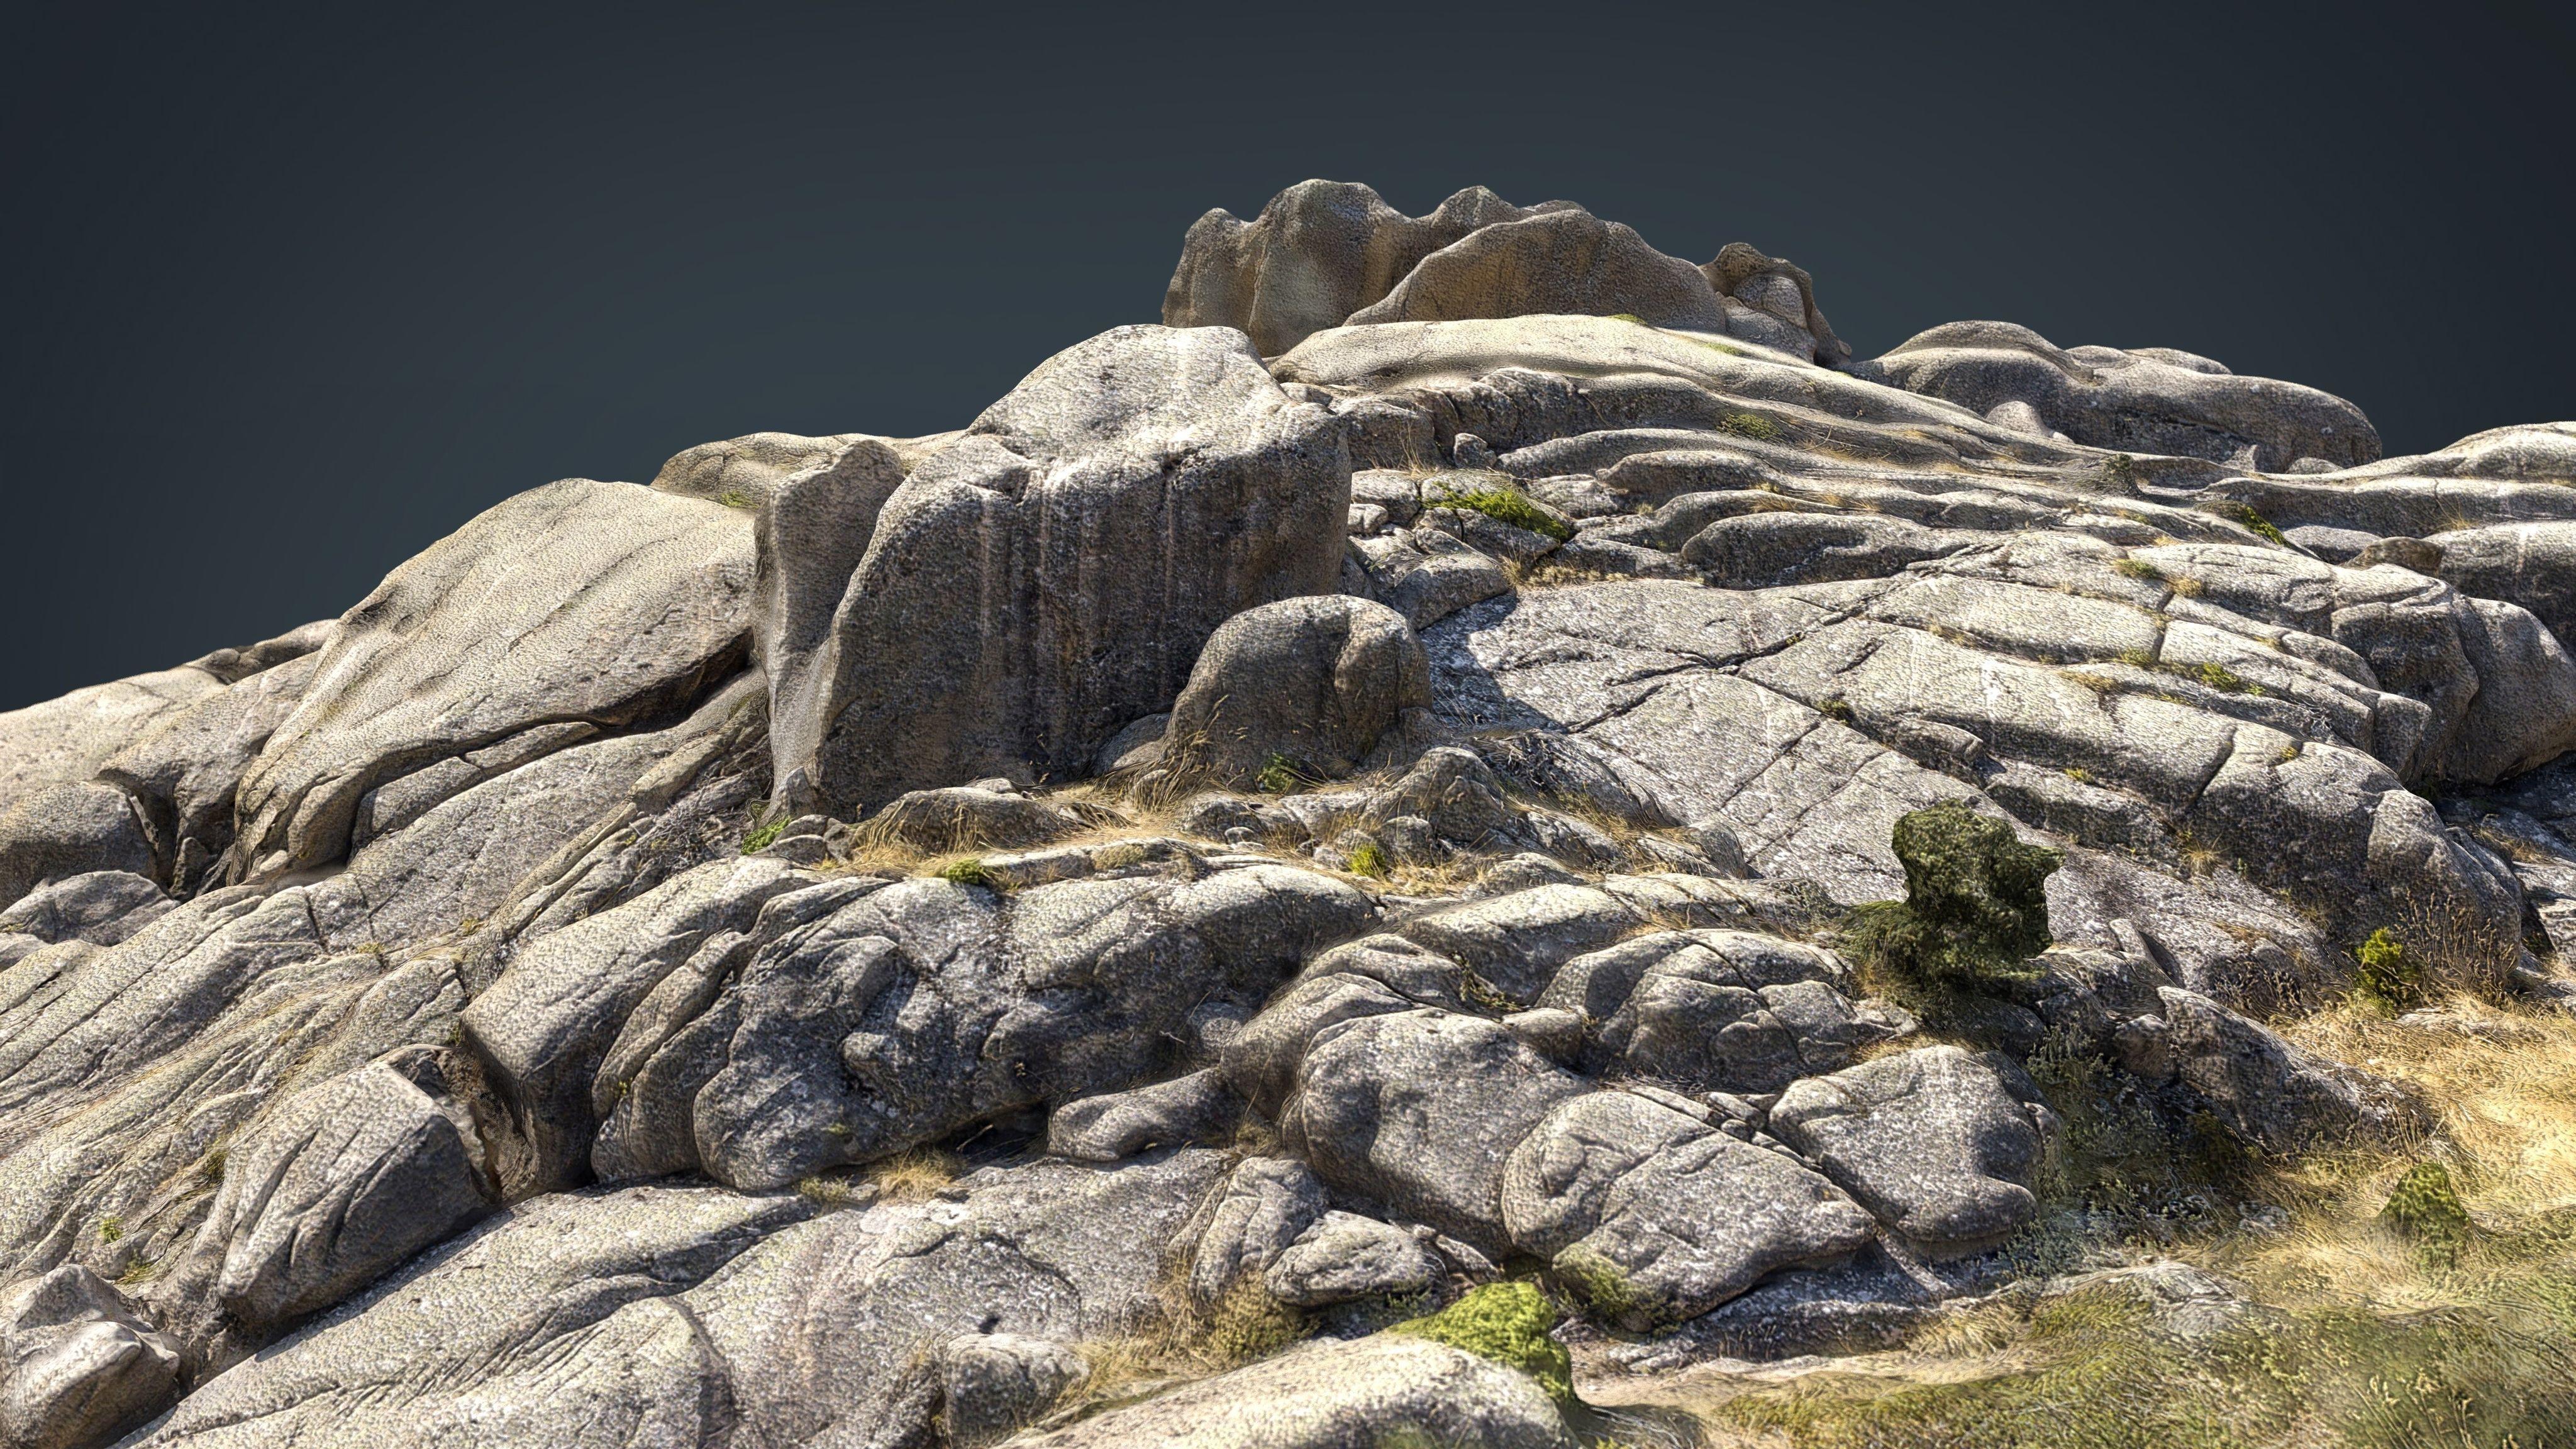 MOUNTAIN ROCKS 4